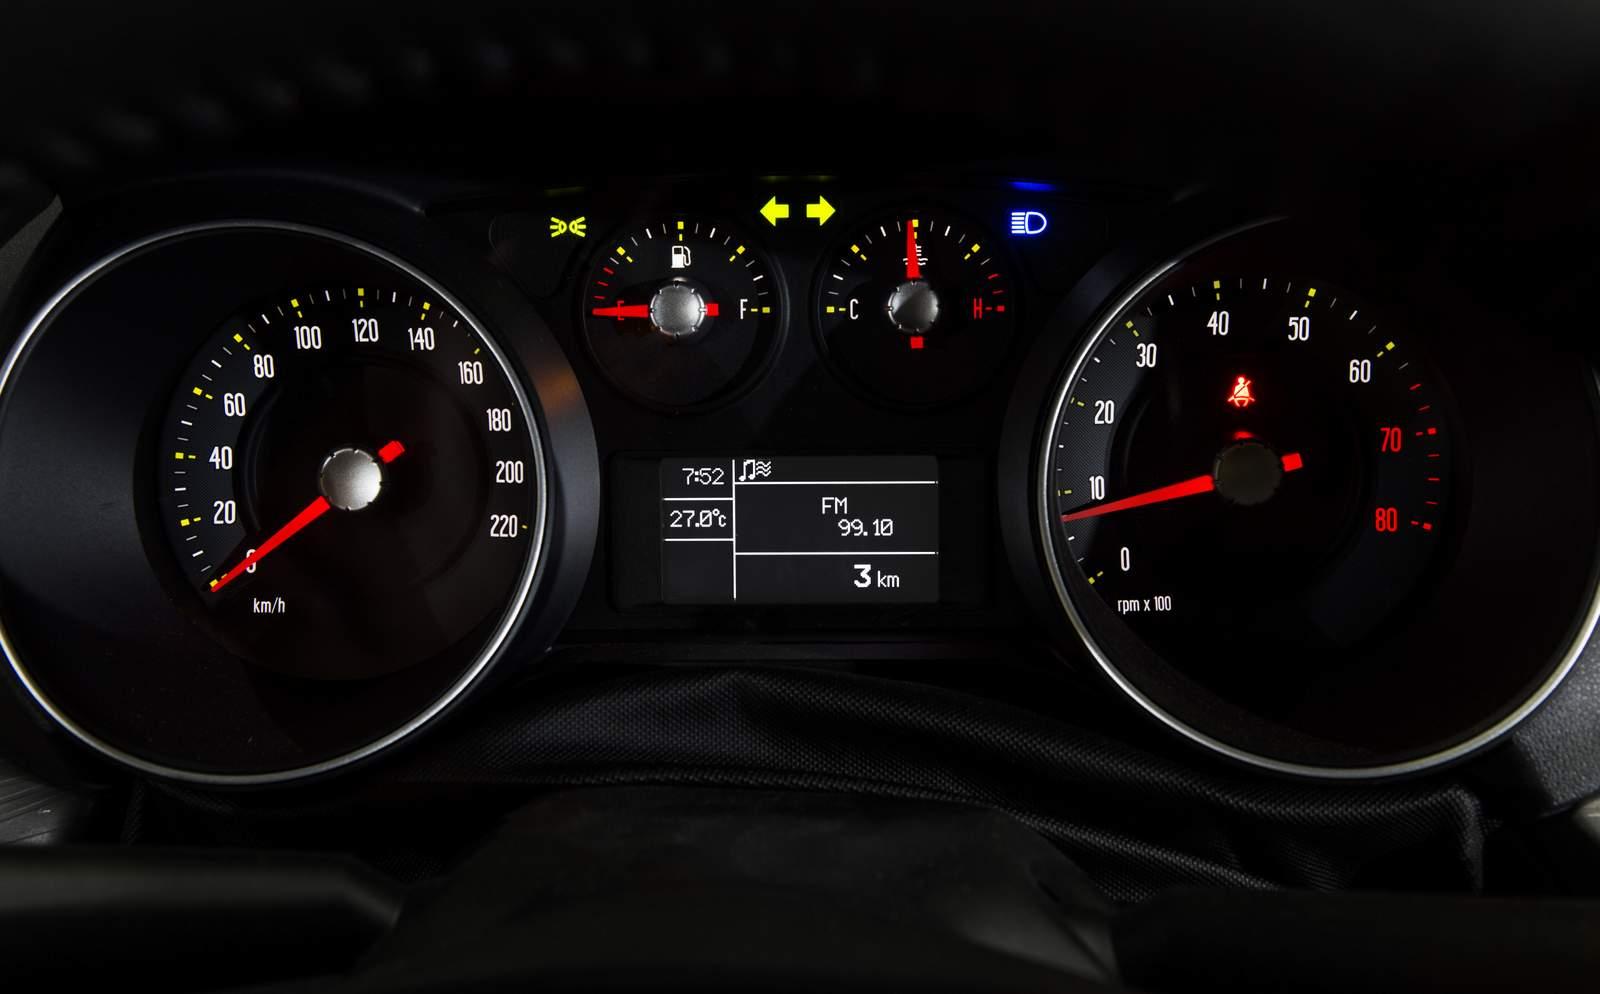 Novo Fiat Punto 2016 - painel